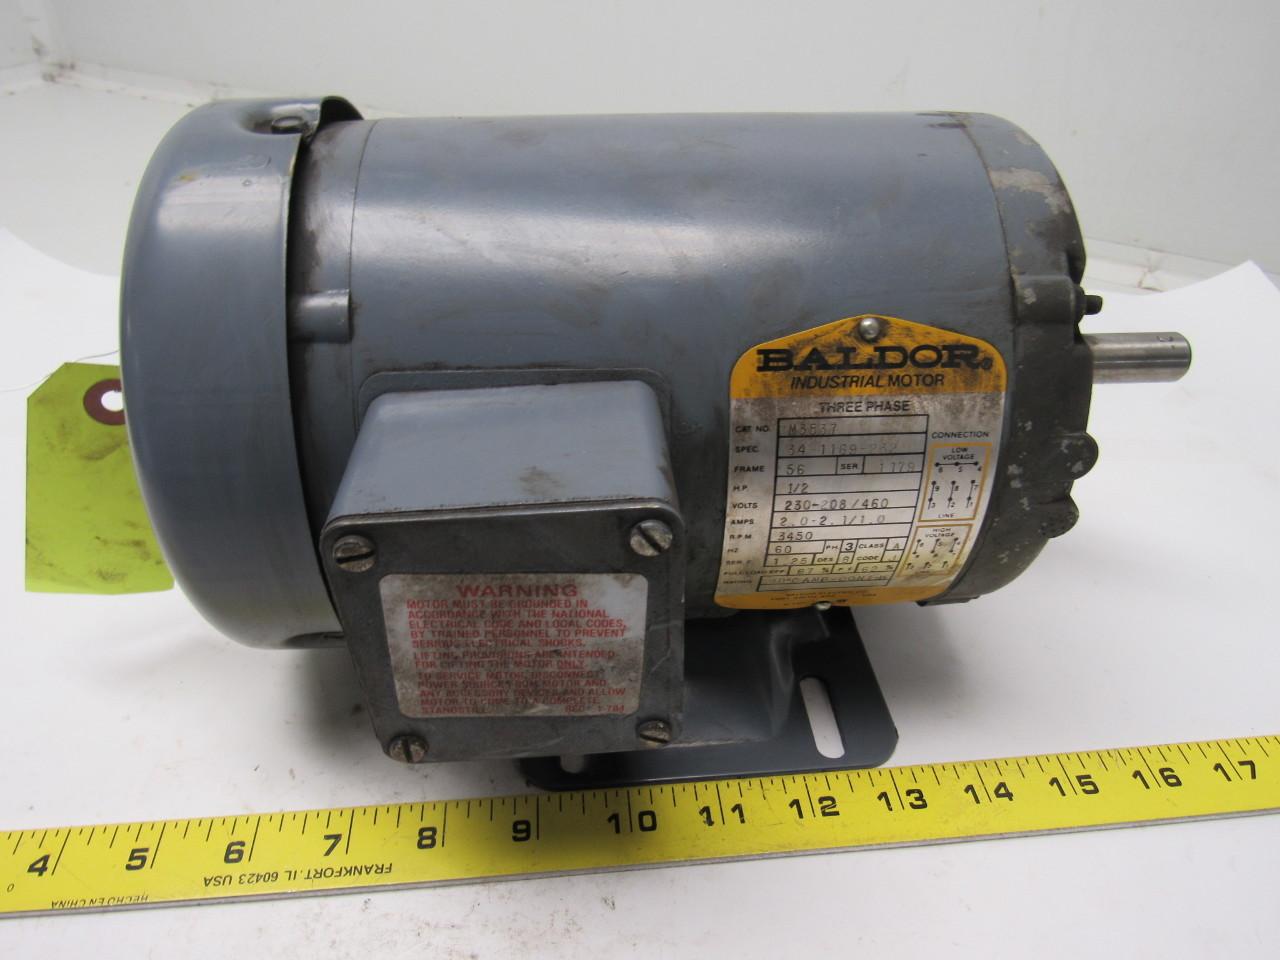 Baldor m3537 1 2 hp electric motor 3ph 208 230 460v for Baldor 2 hp single phase motor